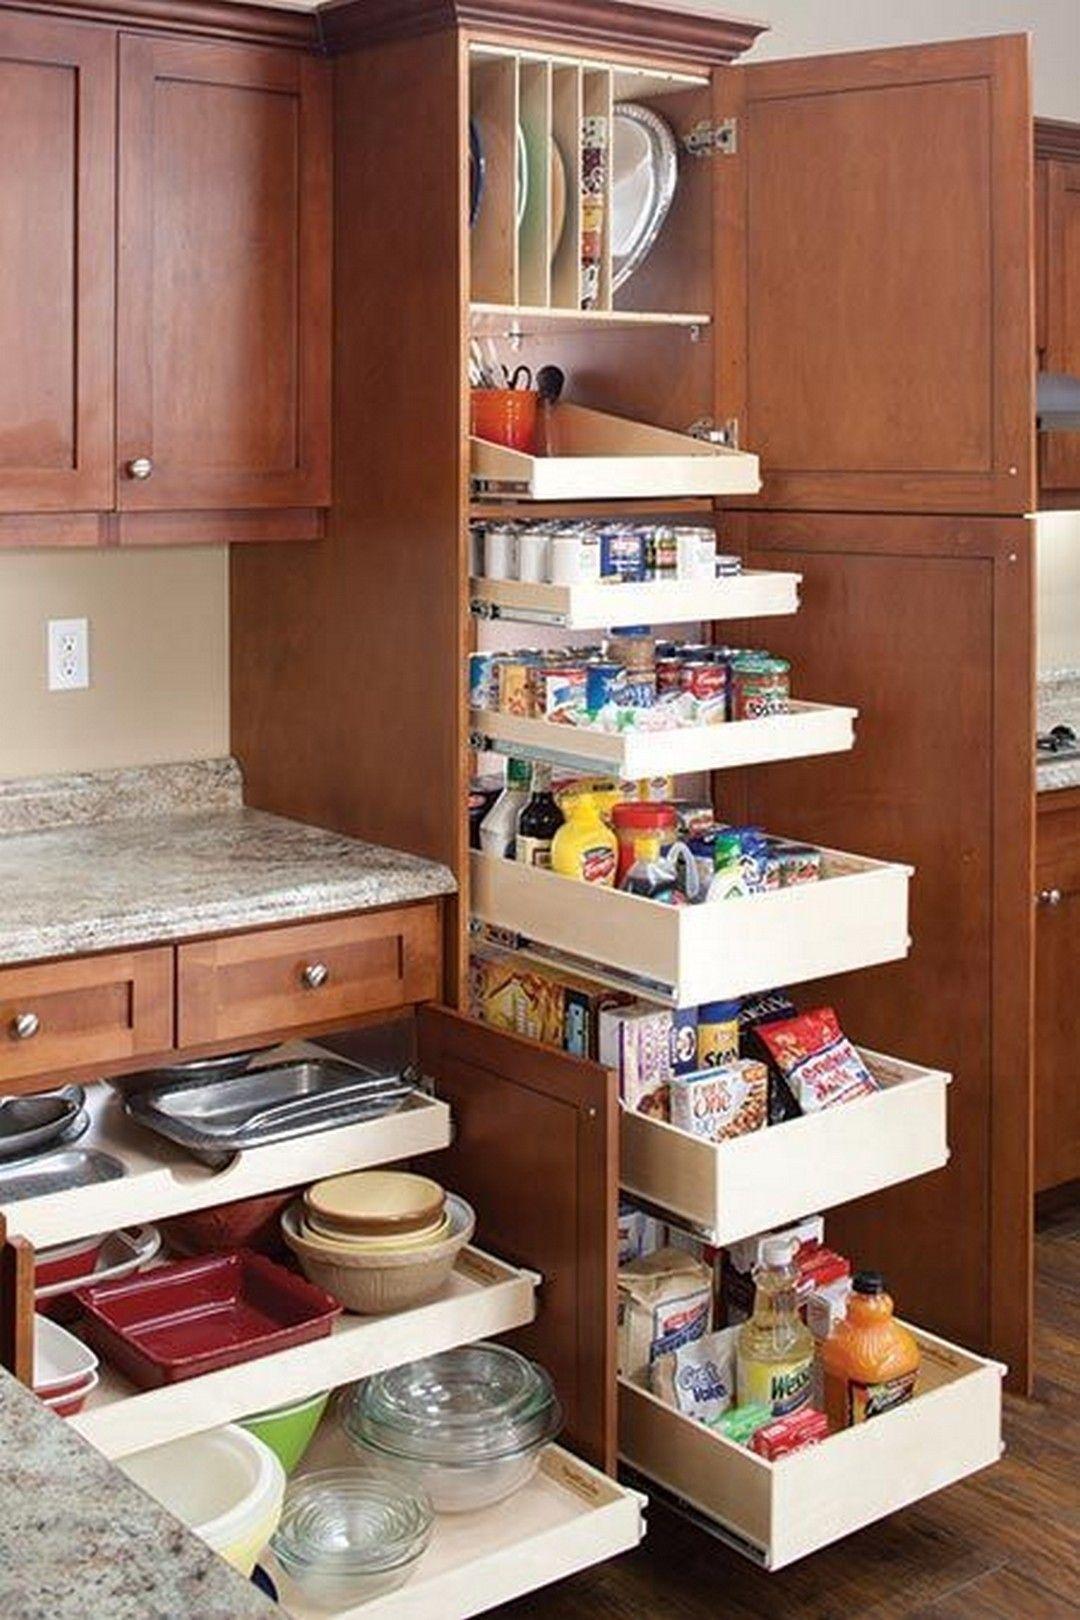 27 kitchen organization ideas you wish you had  kitchen